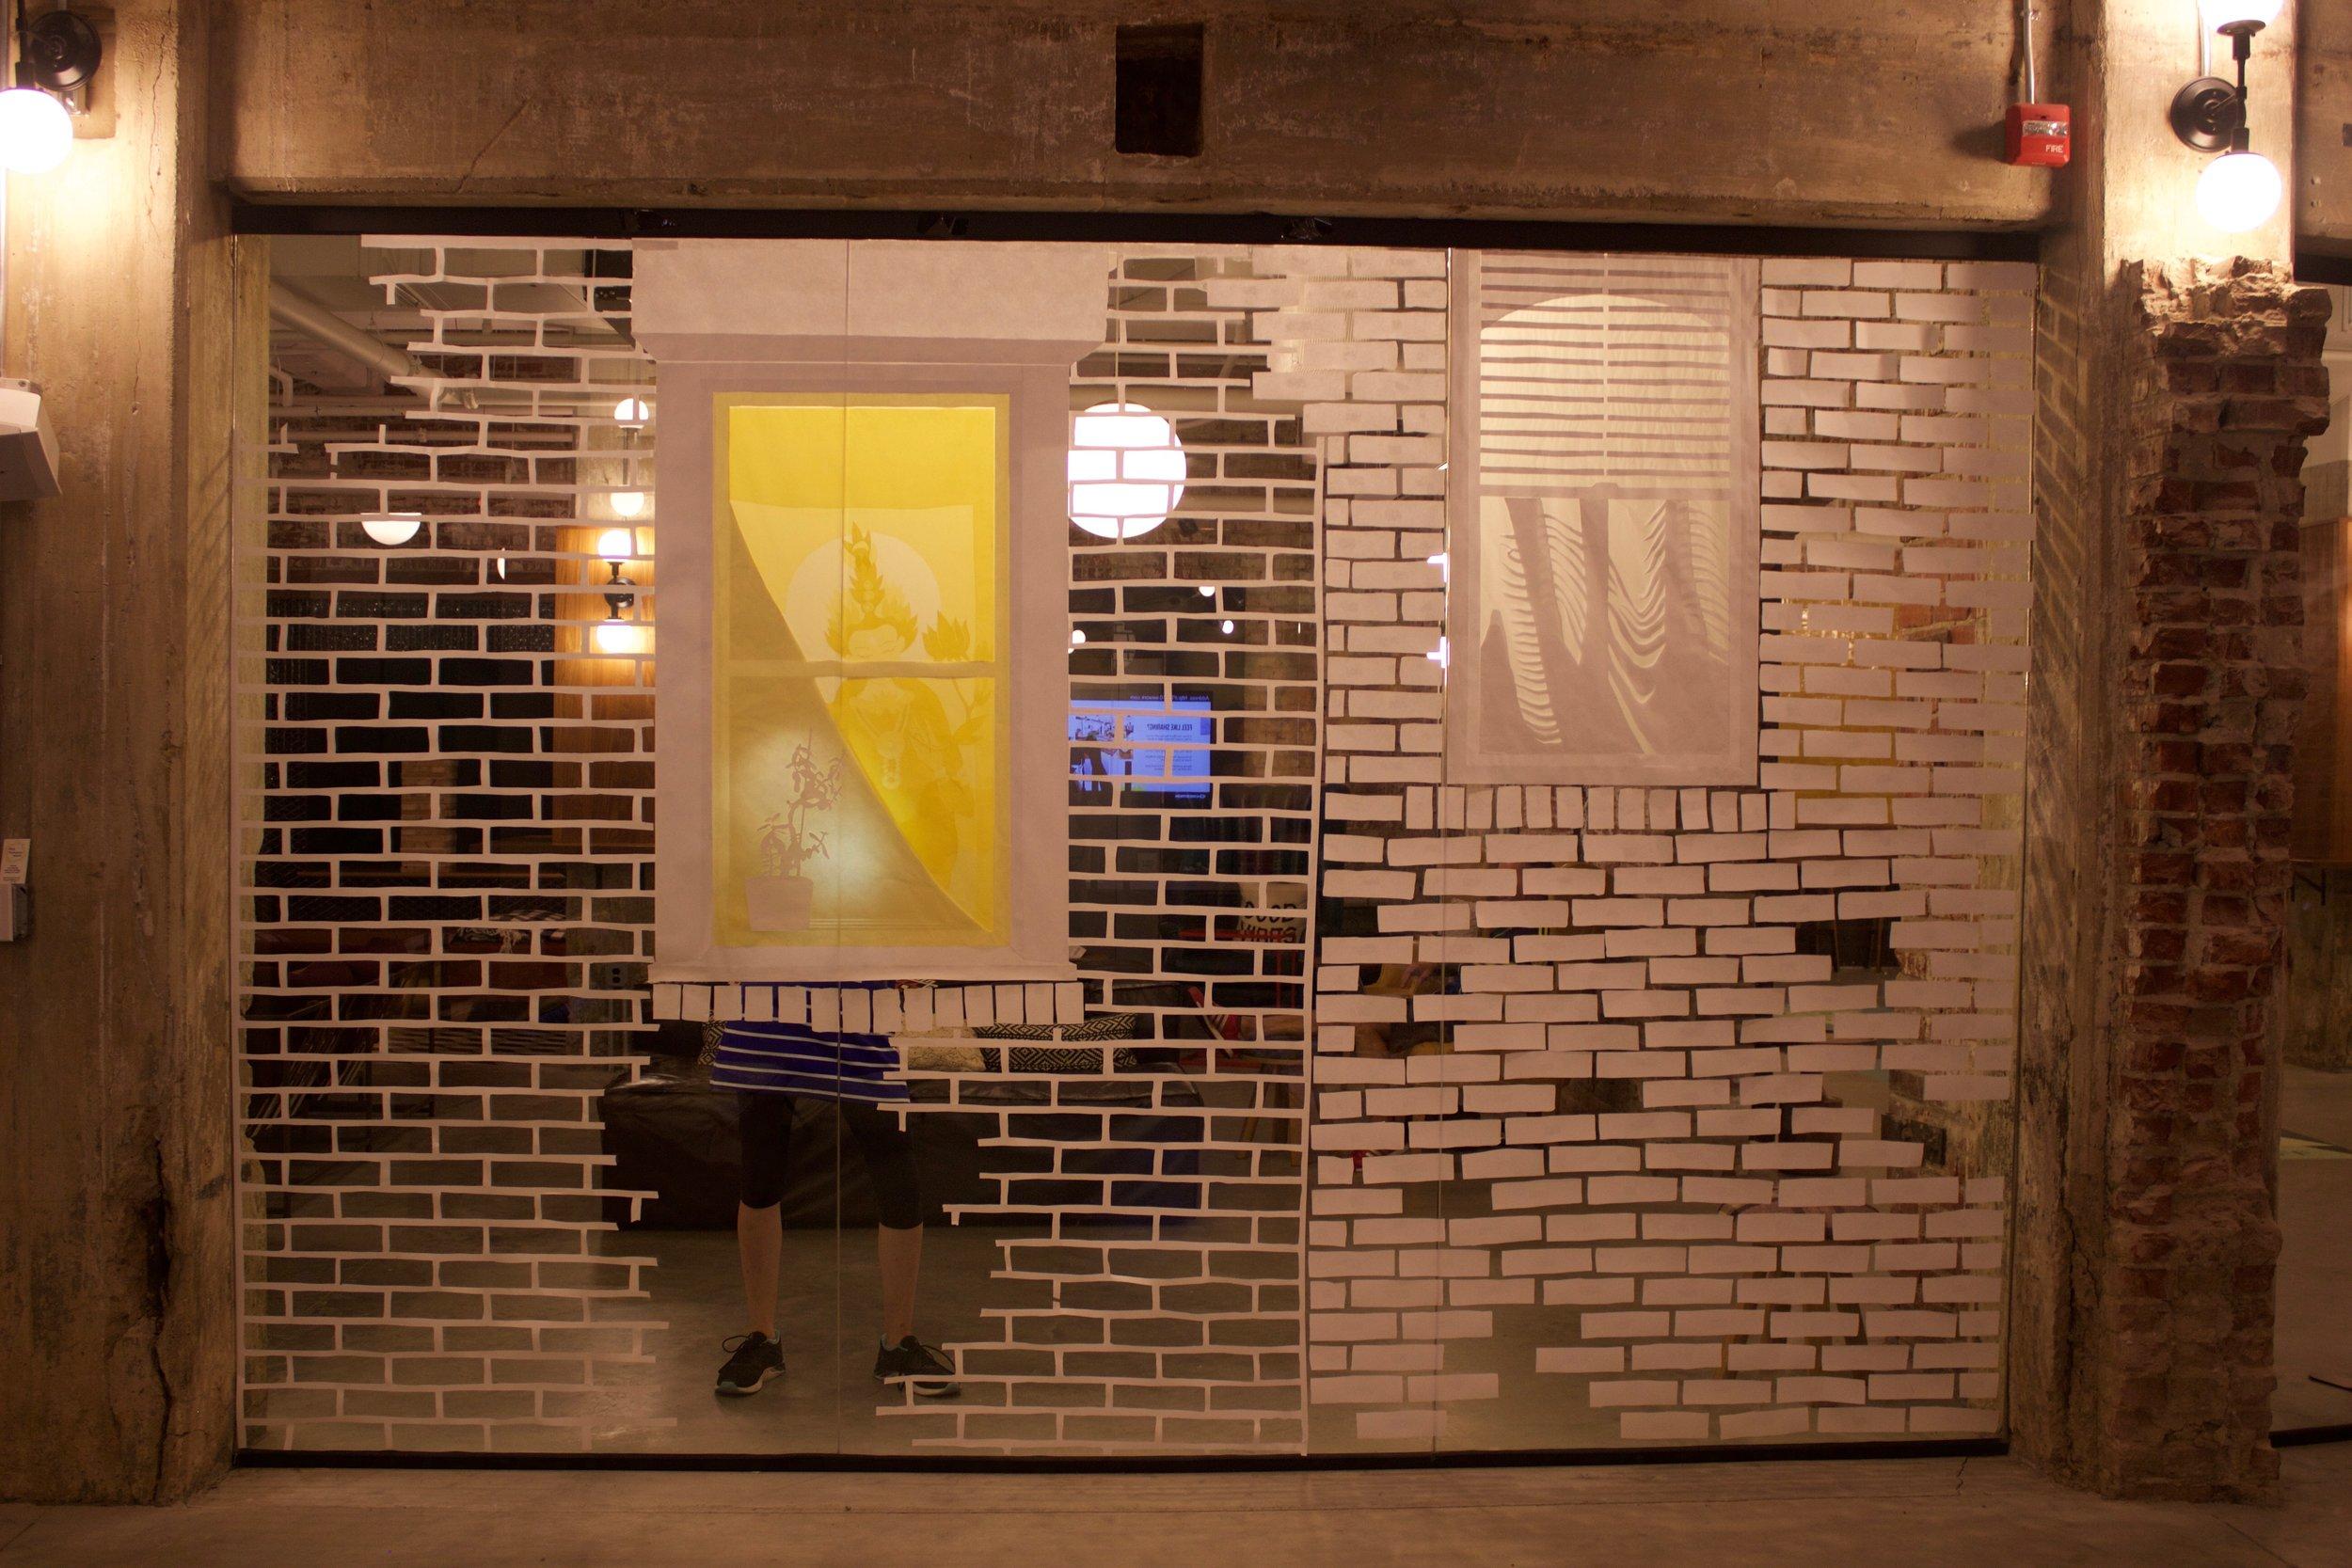 Girard Avenue Windows,  2017, at WeWork - Northern Liberties, Philadelphia.